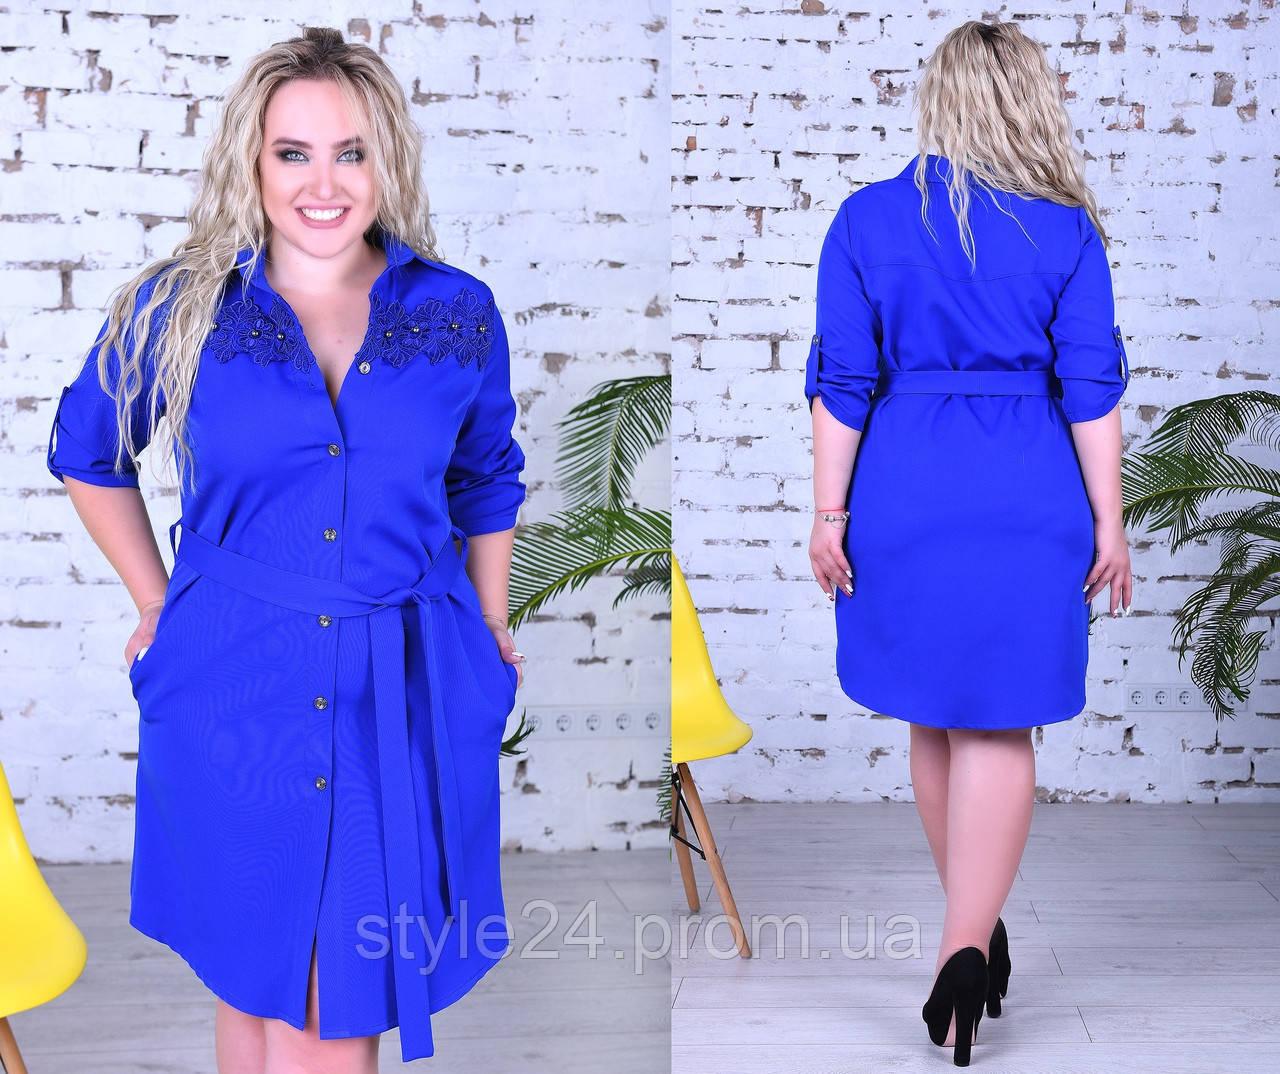 Батальне плаття  кружевом та жемчугом, 2 кольори.Р-ри 50 -56